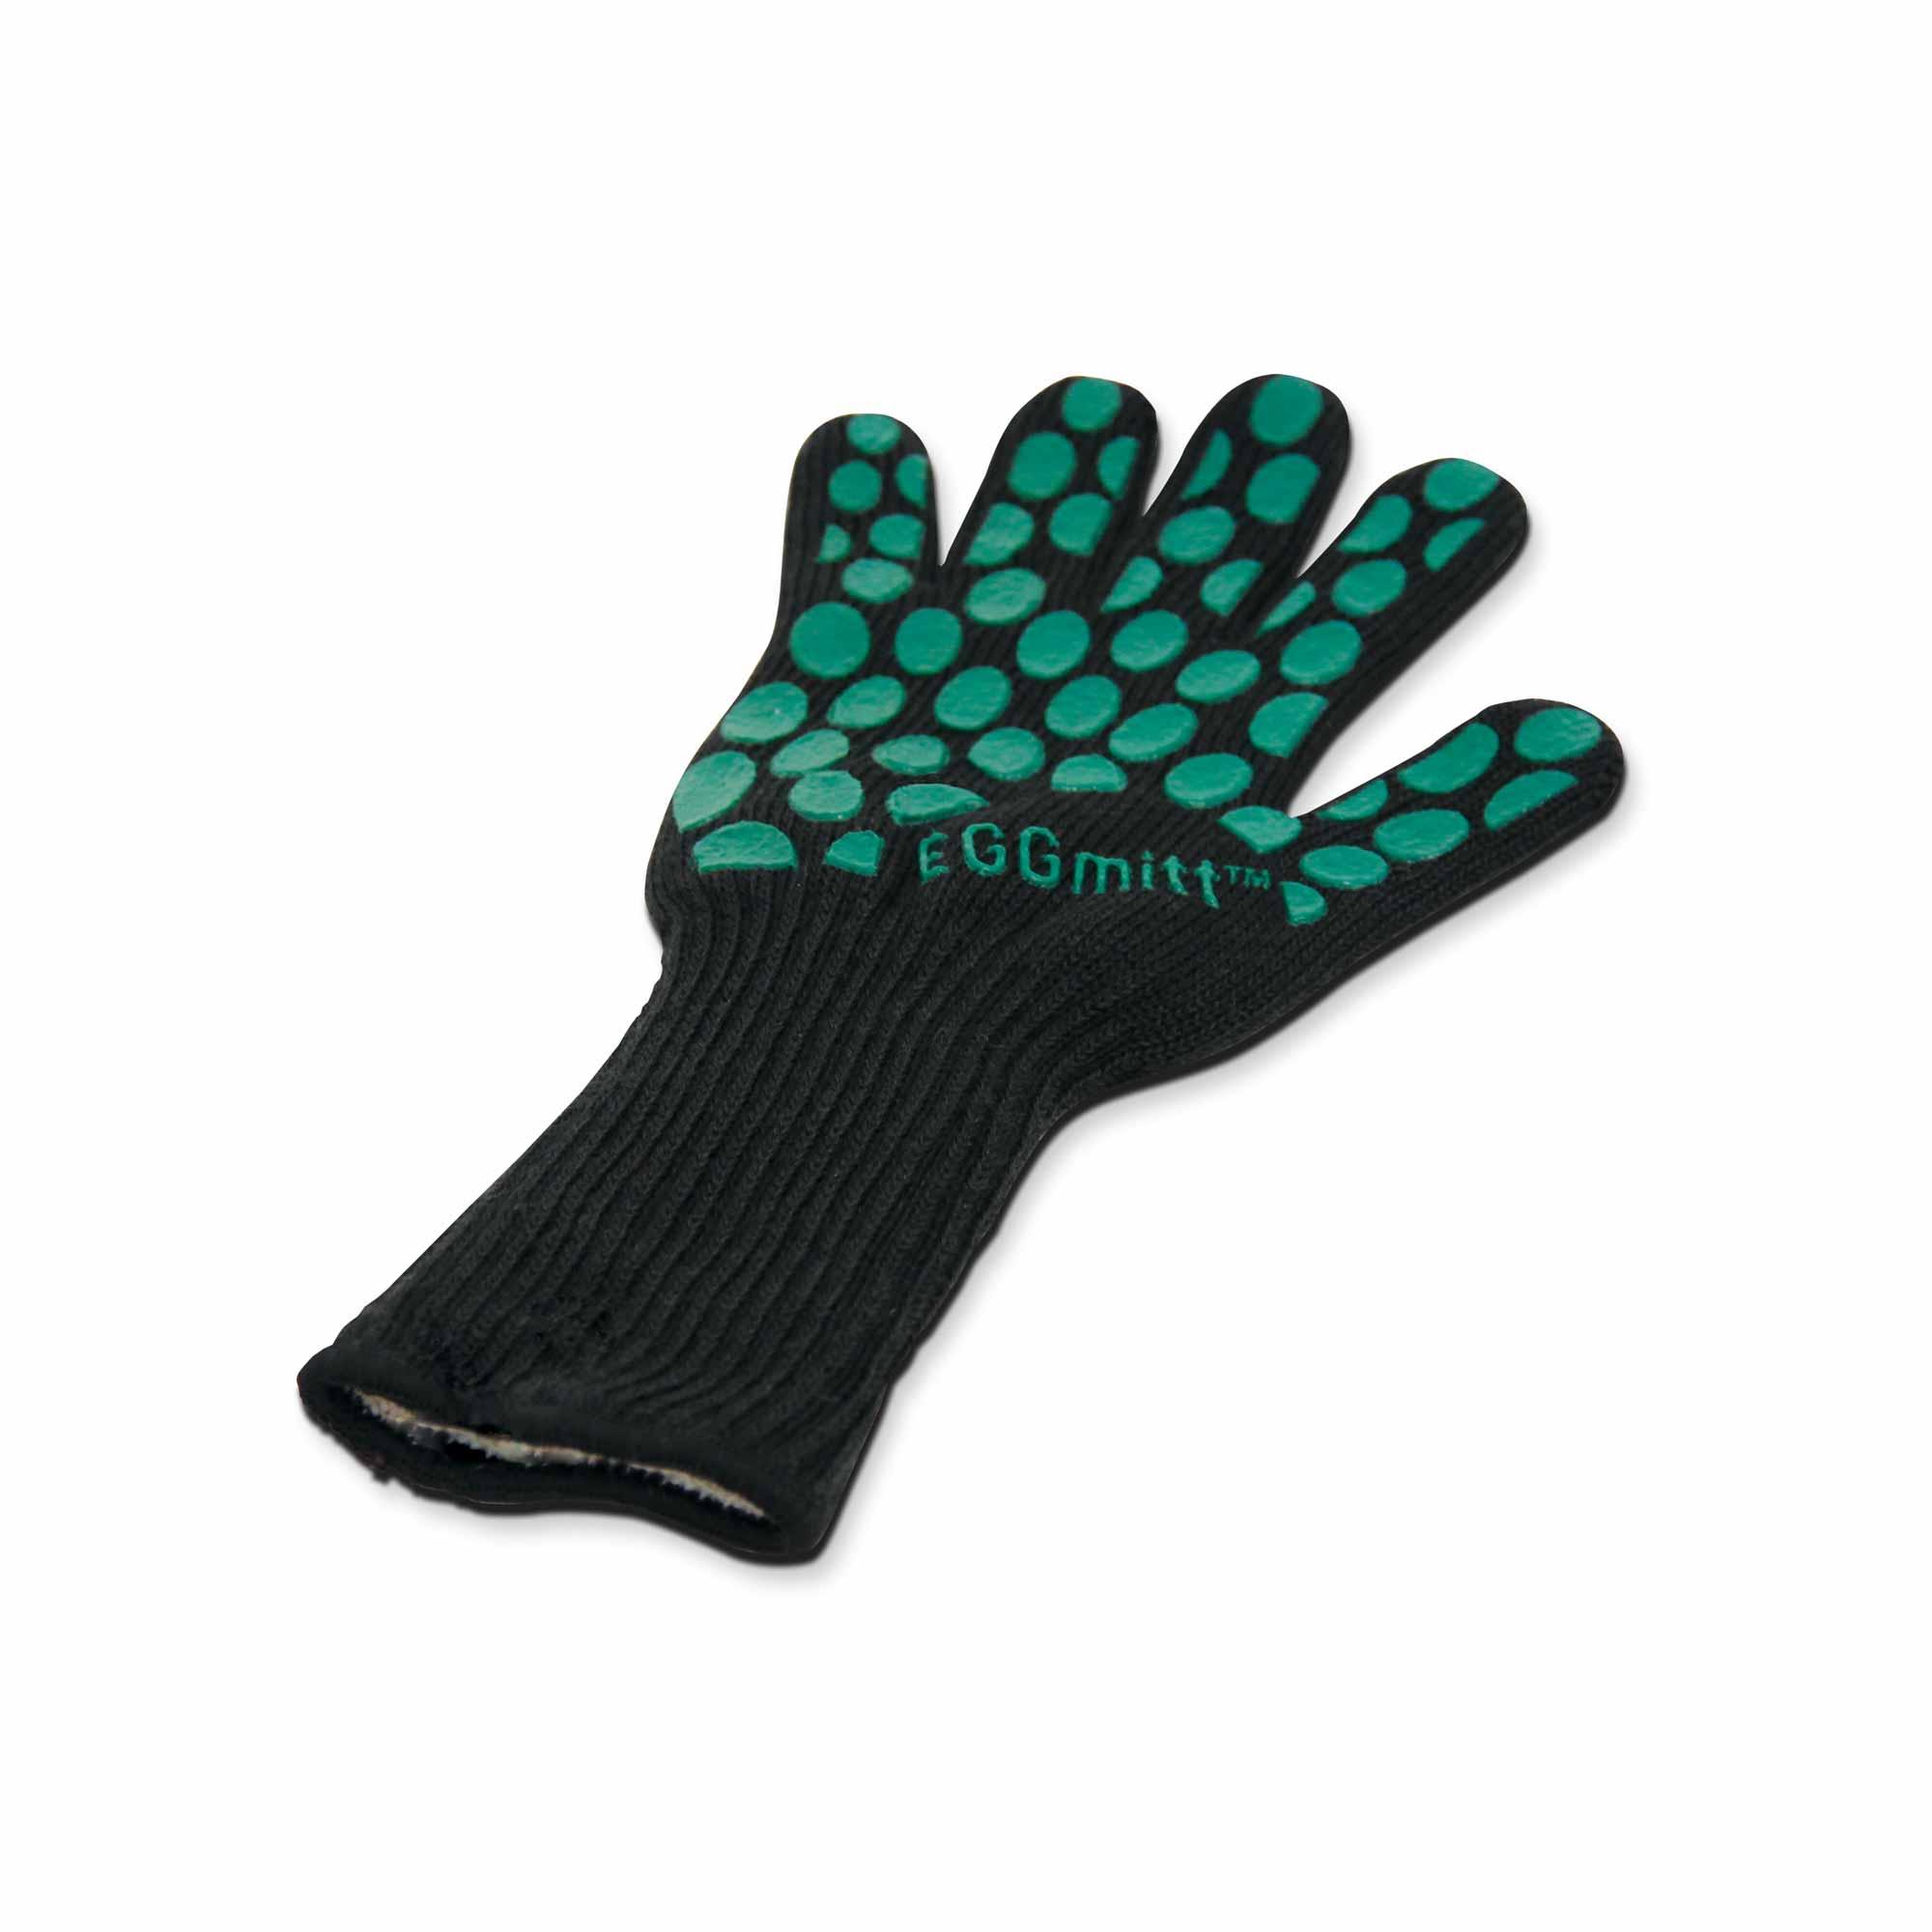 Heat Resistant EGGmitt BBQ Glove